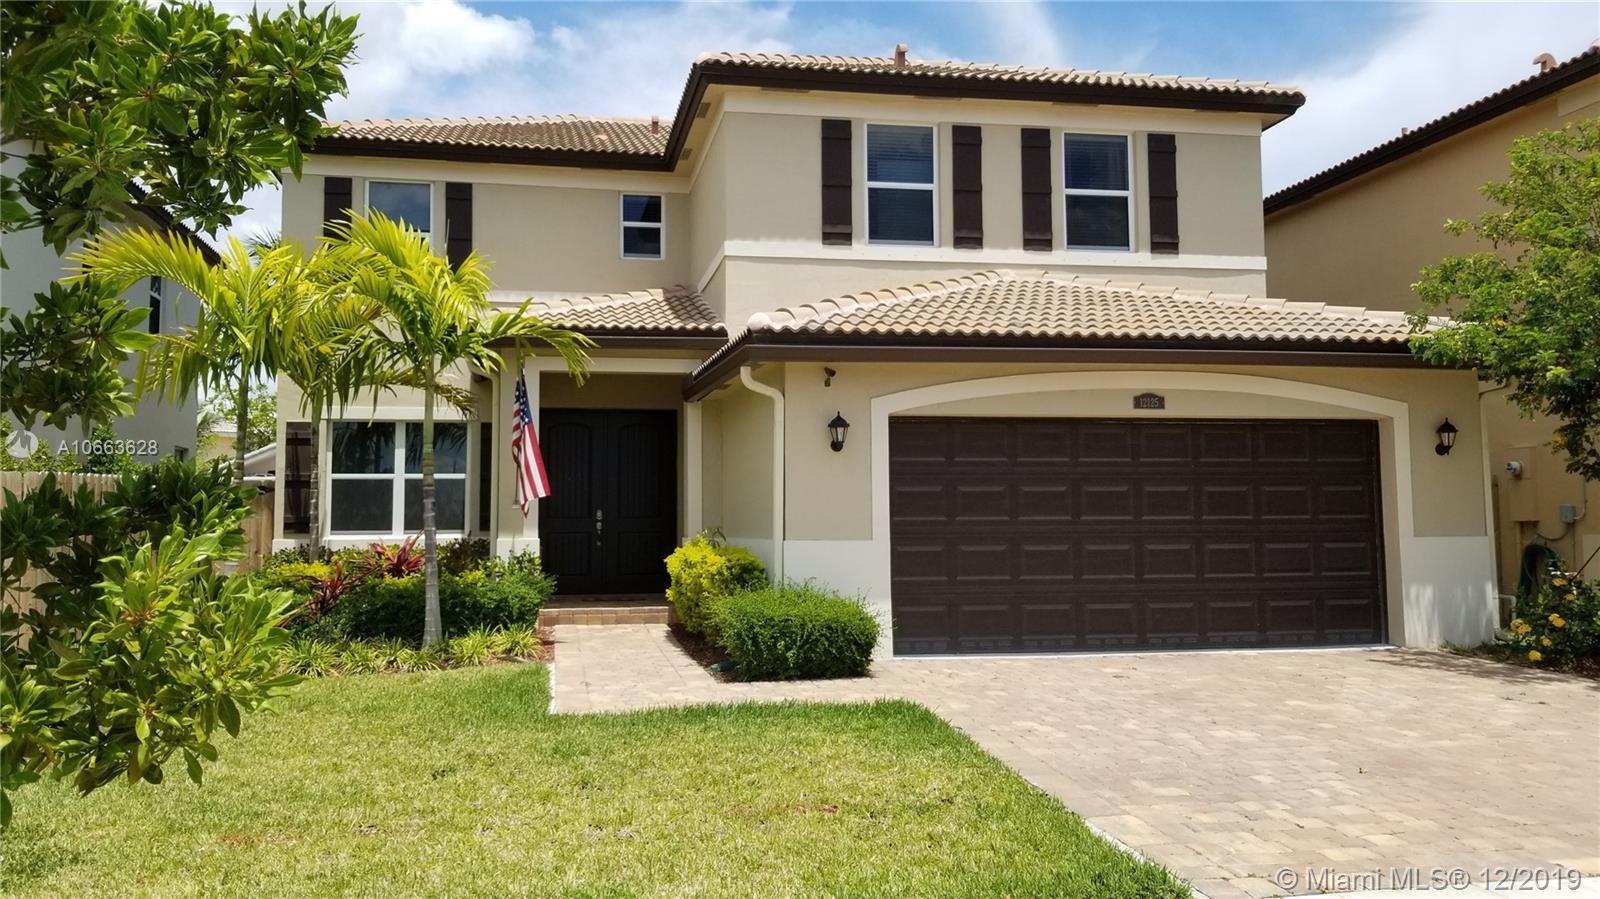 12125 SW 253rd St, Homestead, FL 33032 - Homestead, FL real estate listing